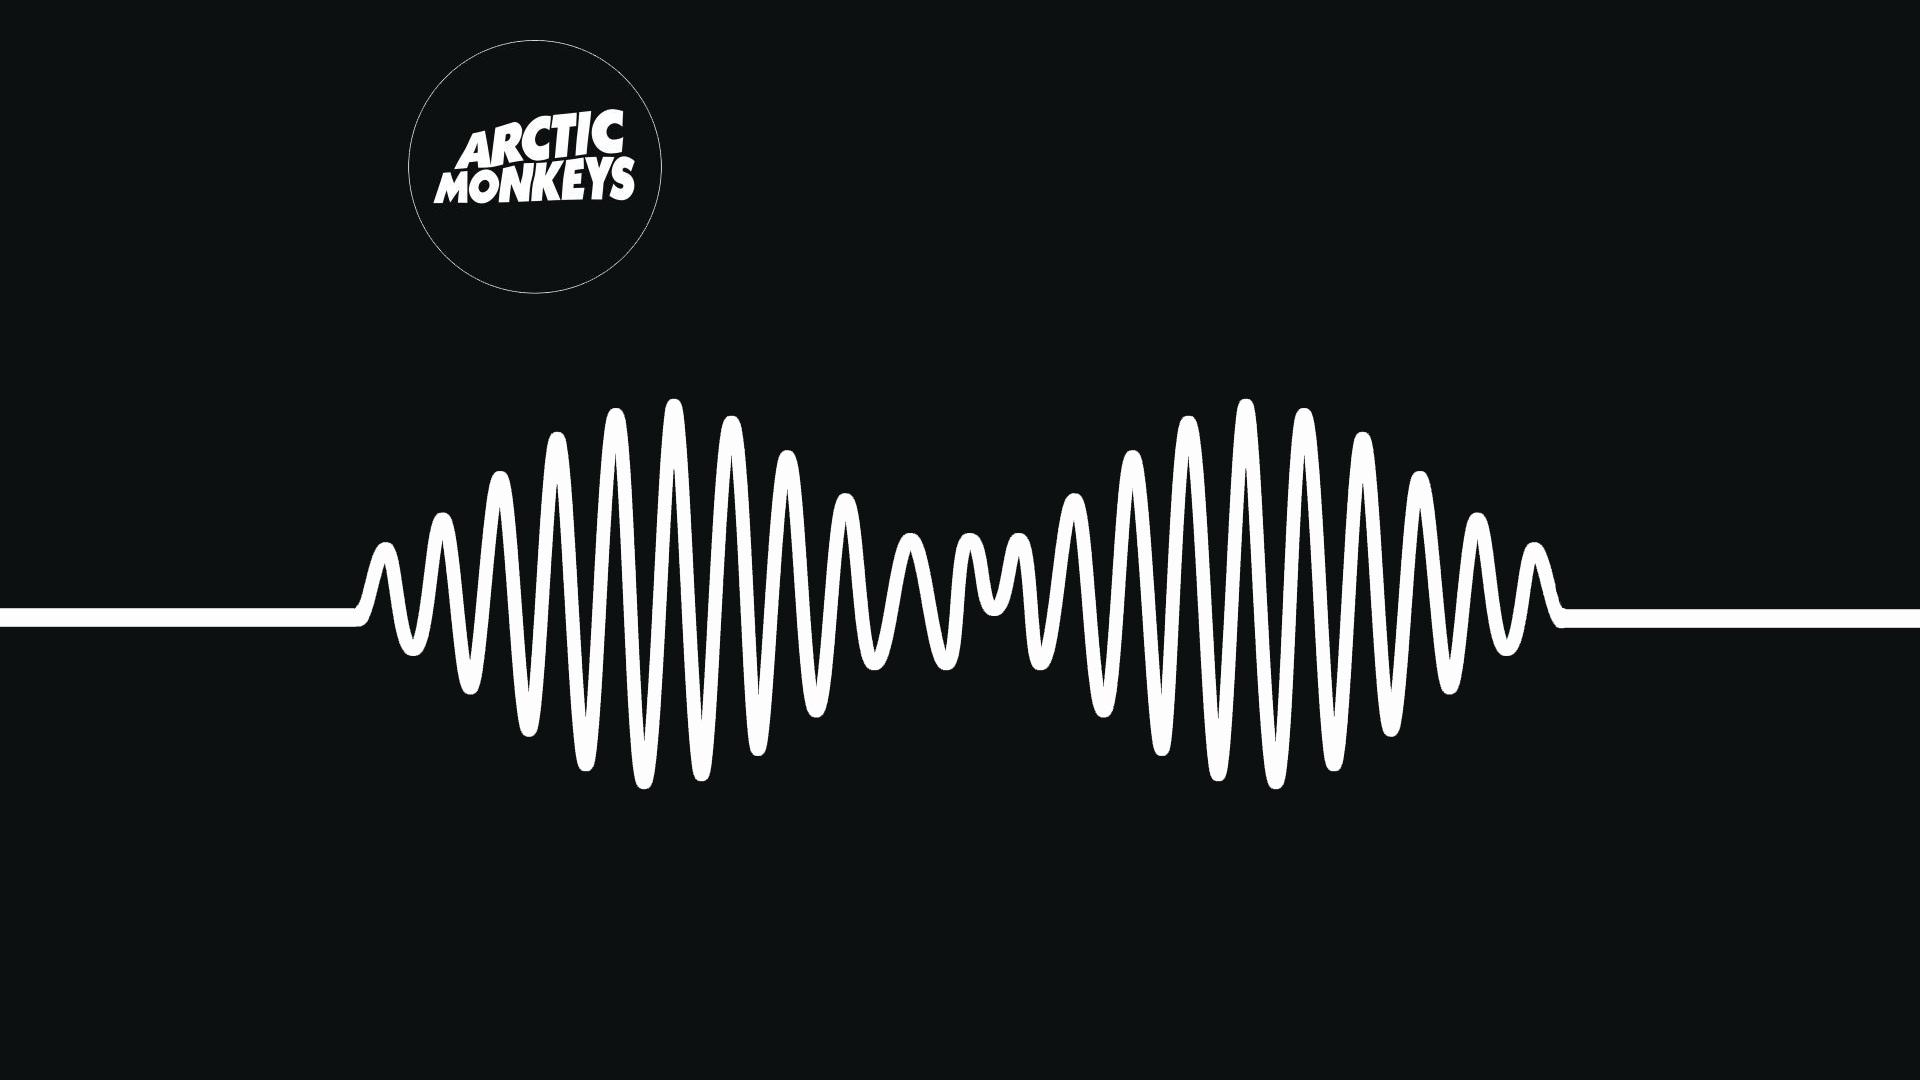 Arctic Monkeys Fondo De Pantalla HD